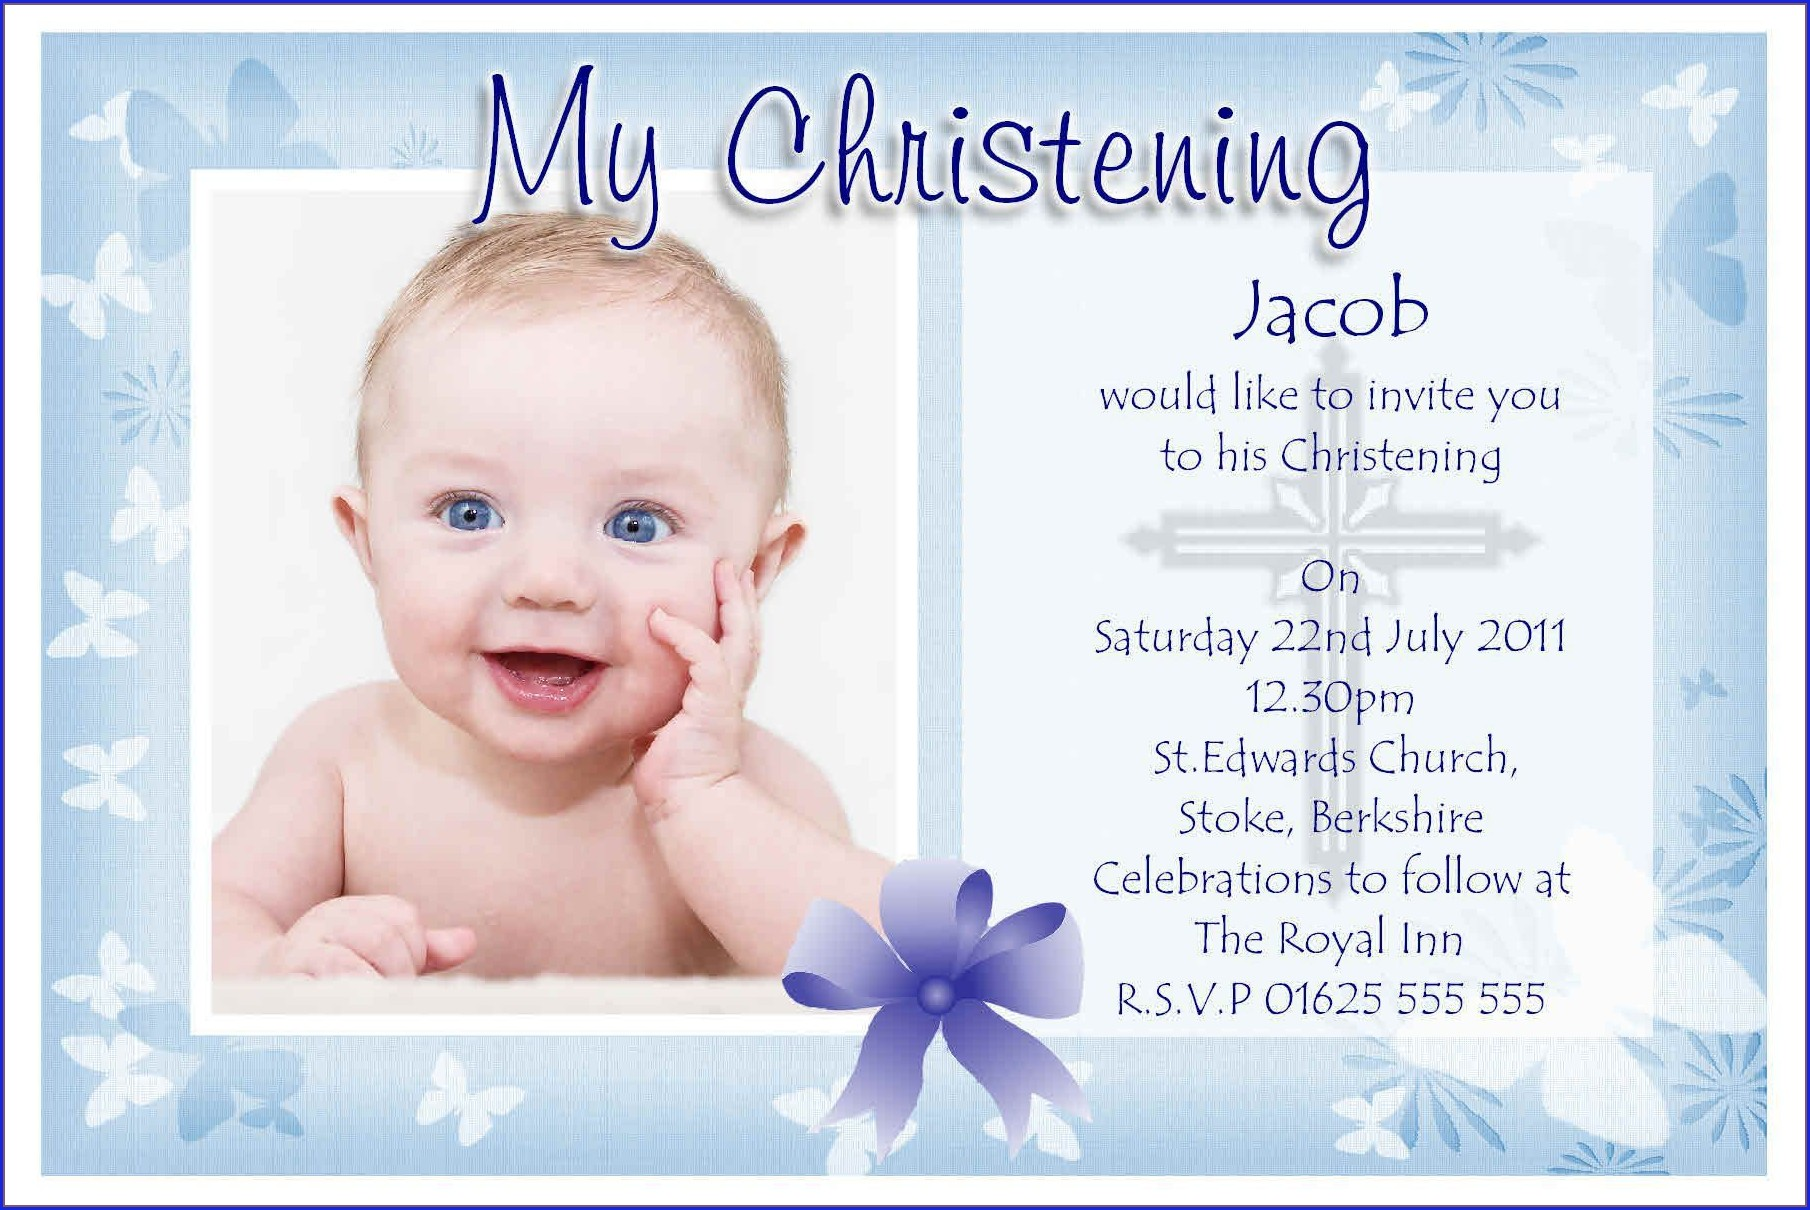 Baby Boy Invitation Card For Christening Blank Background